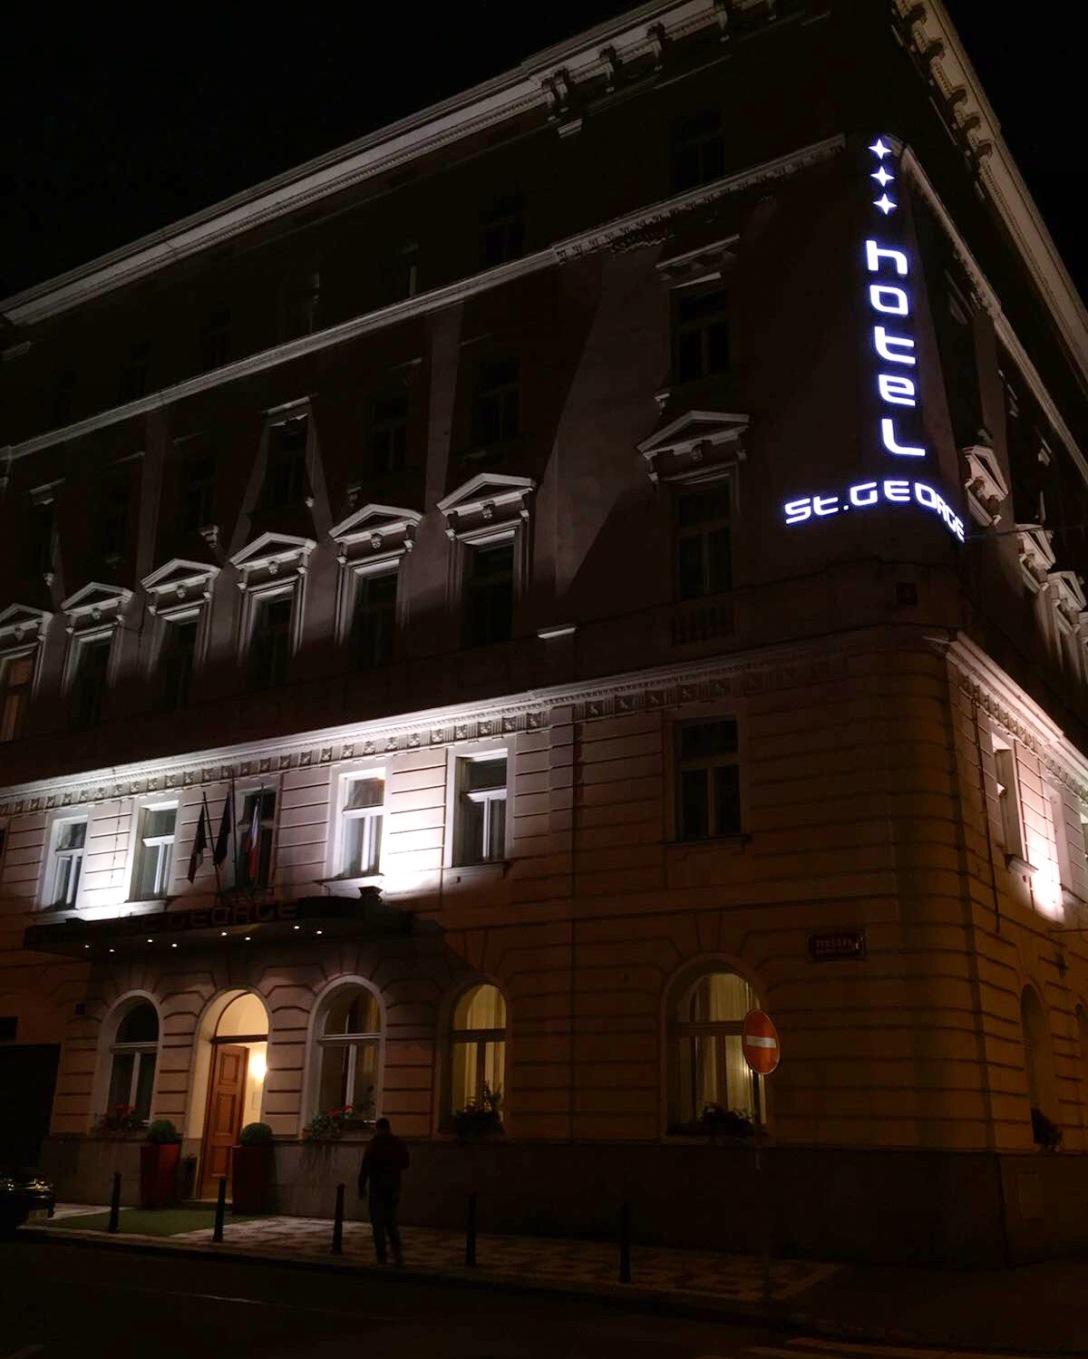 hotel-st-george